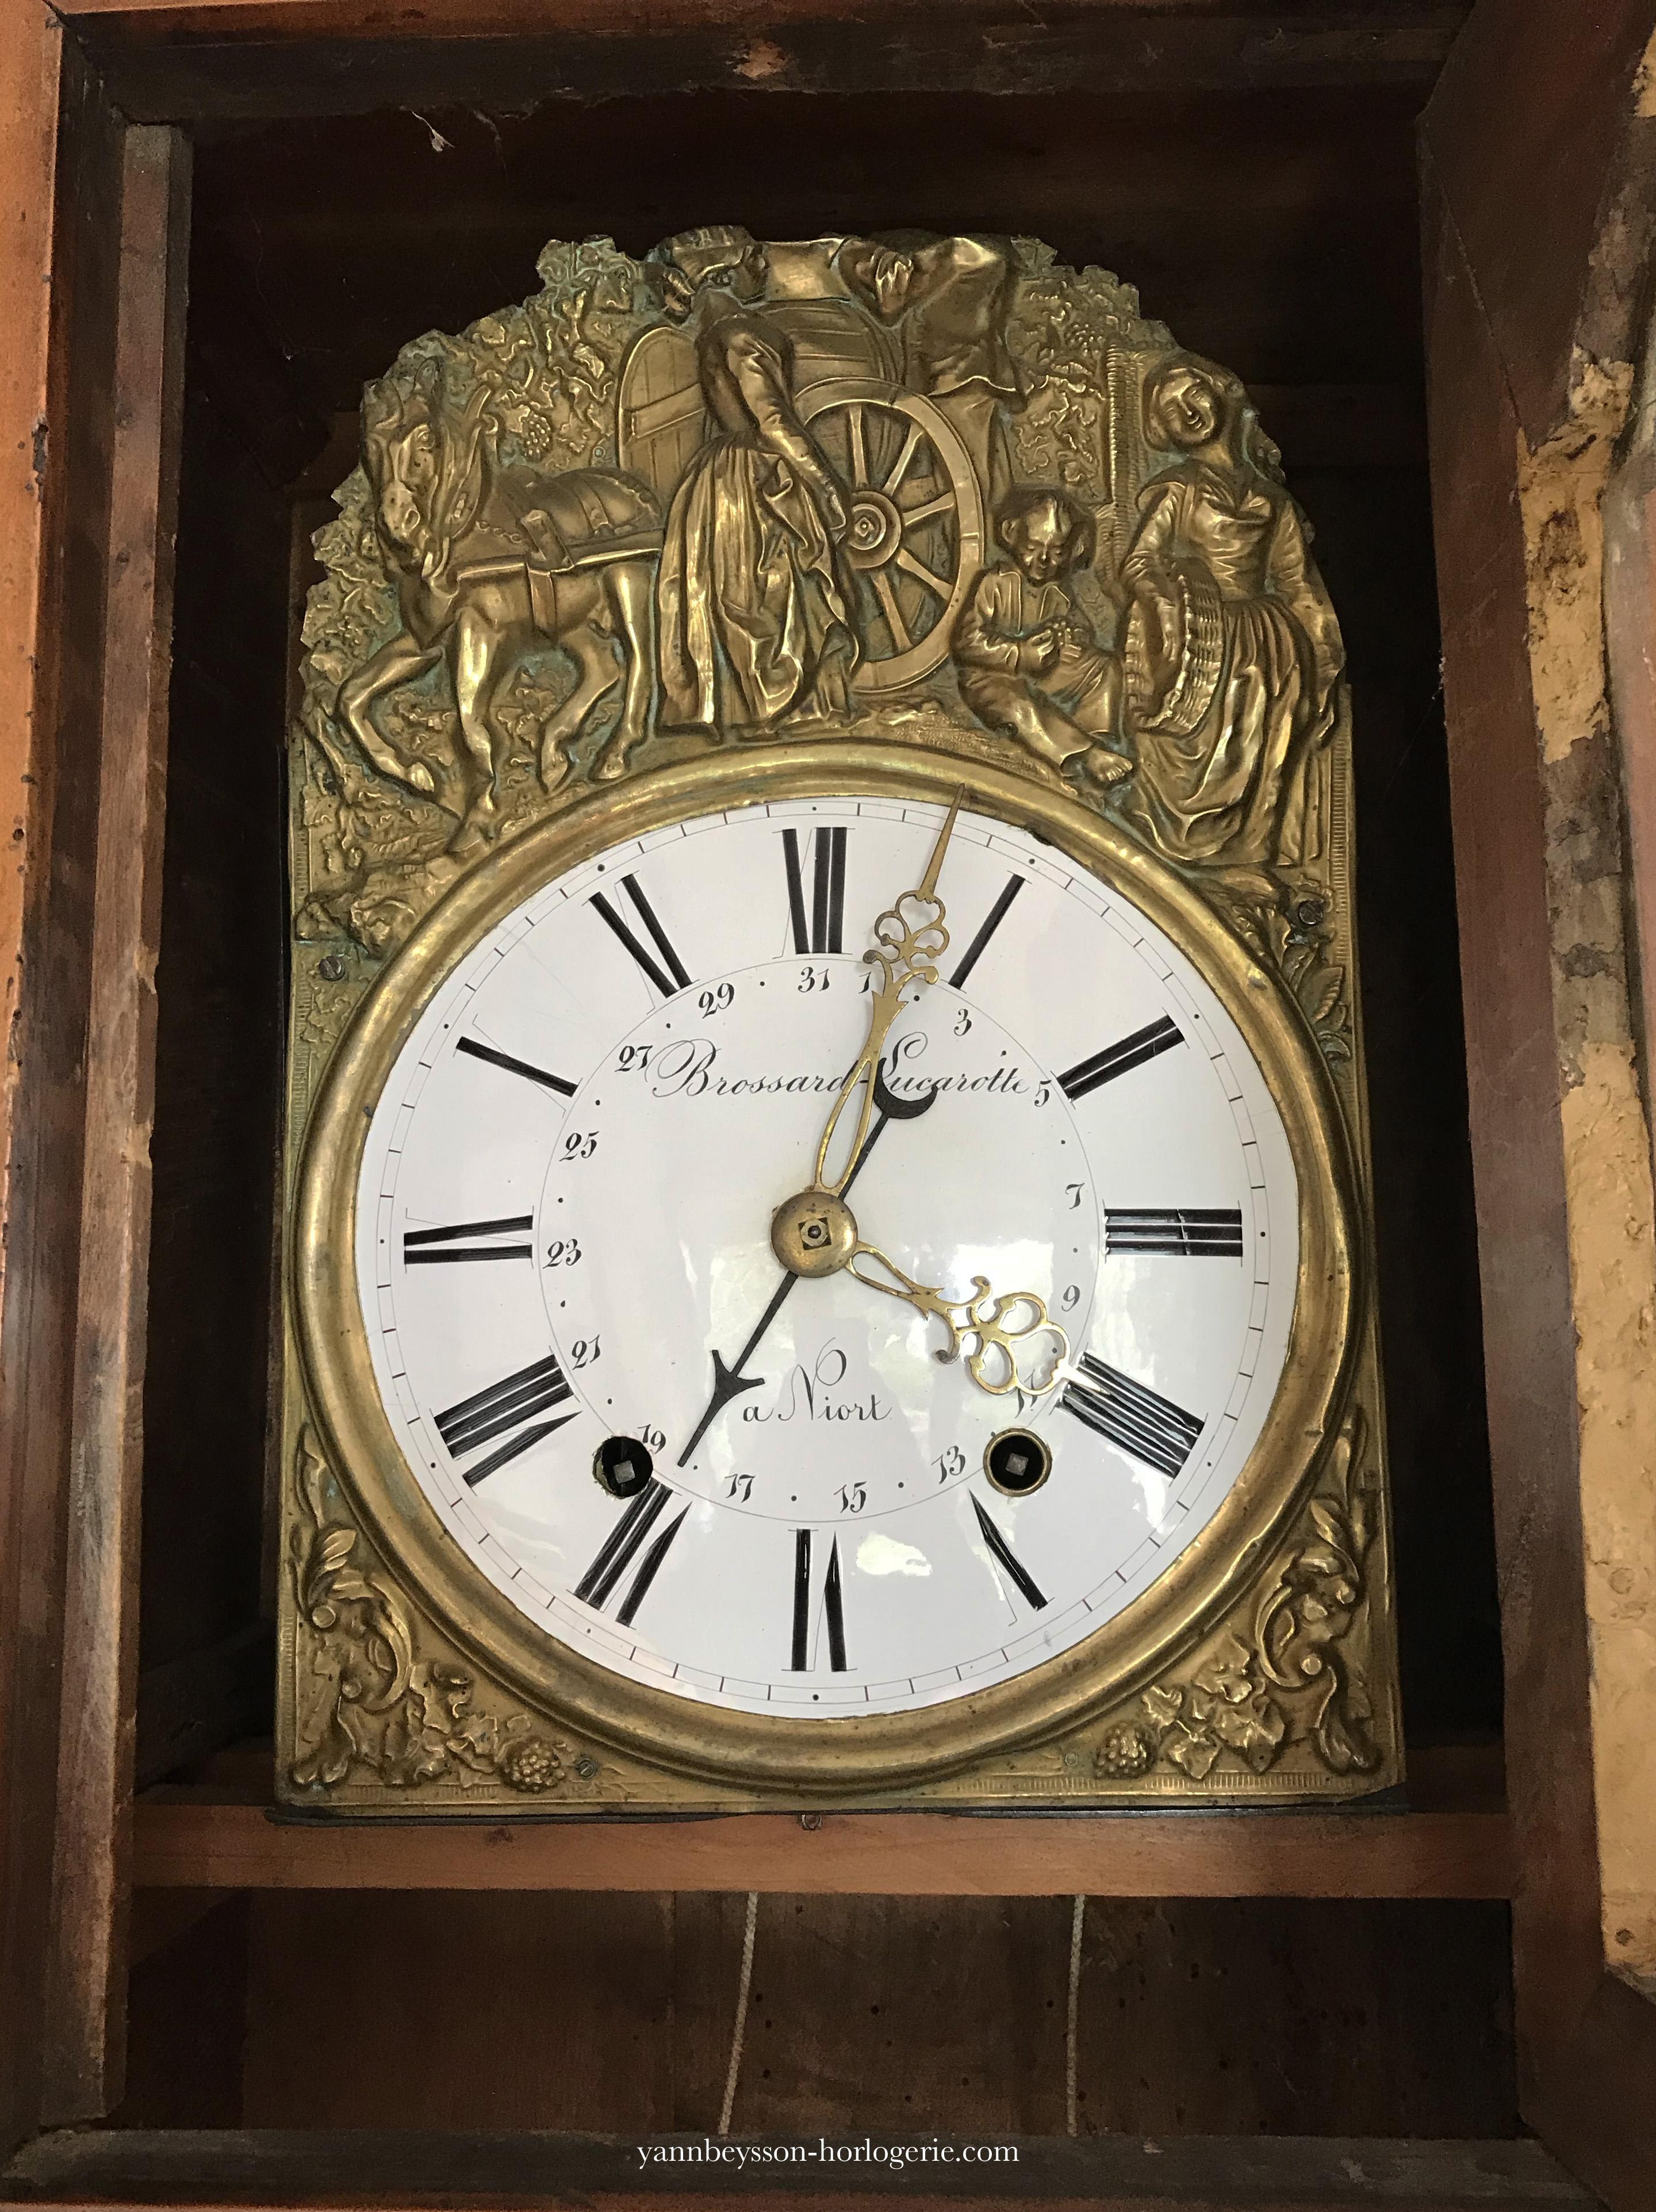 comtoise-yann-beysson-horlogerie-cadran